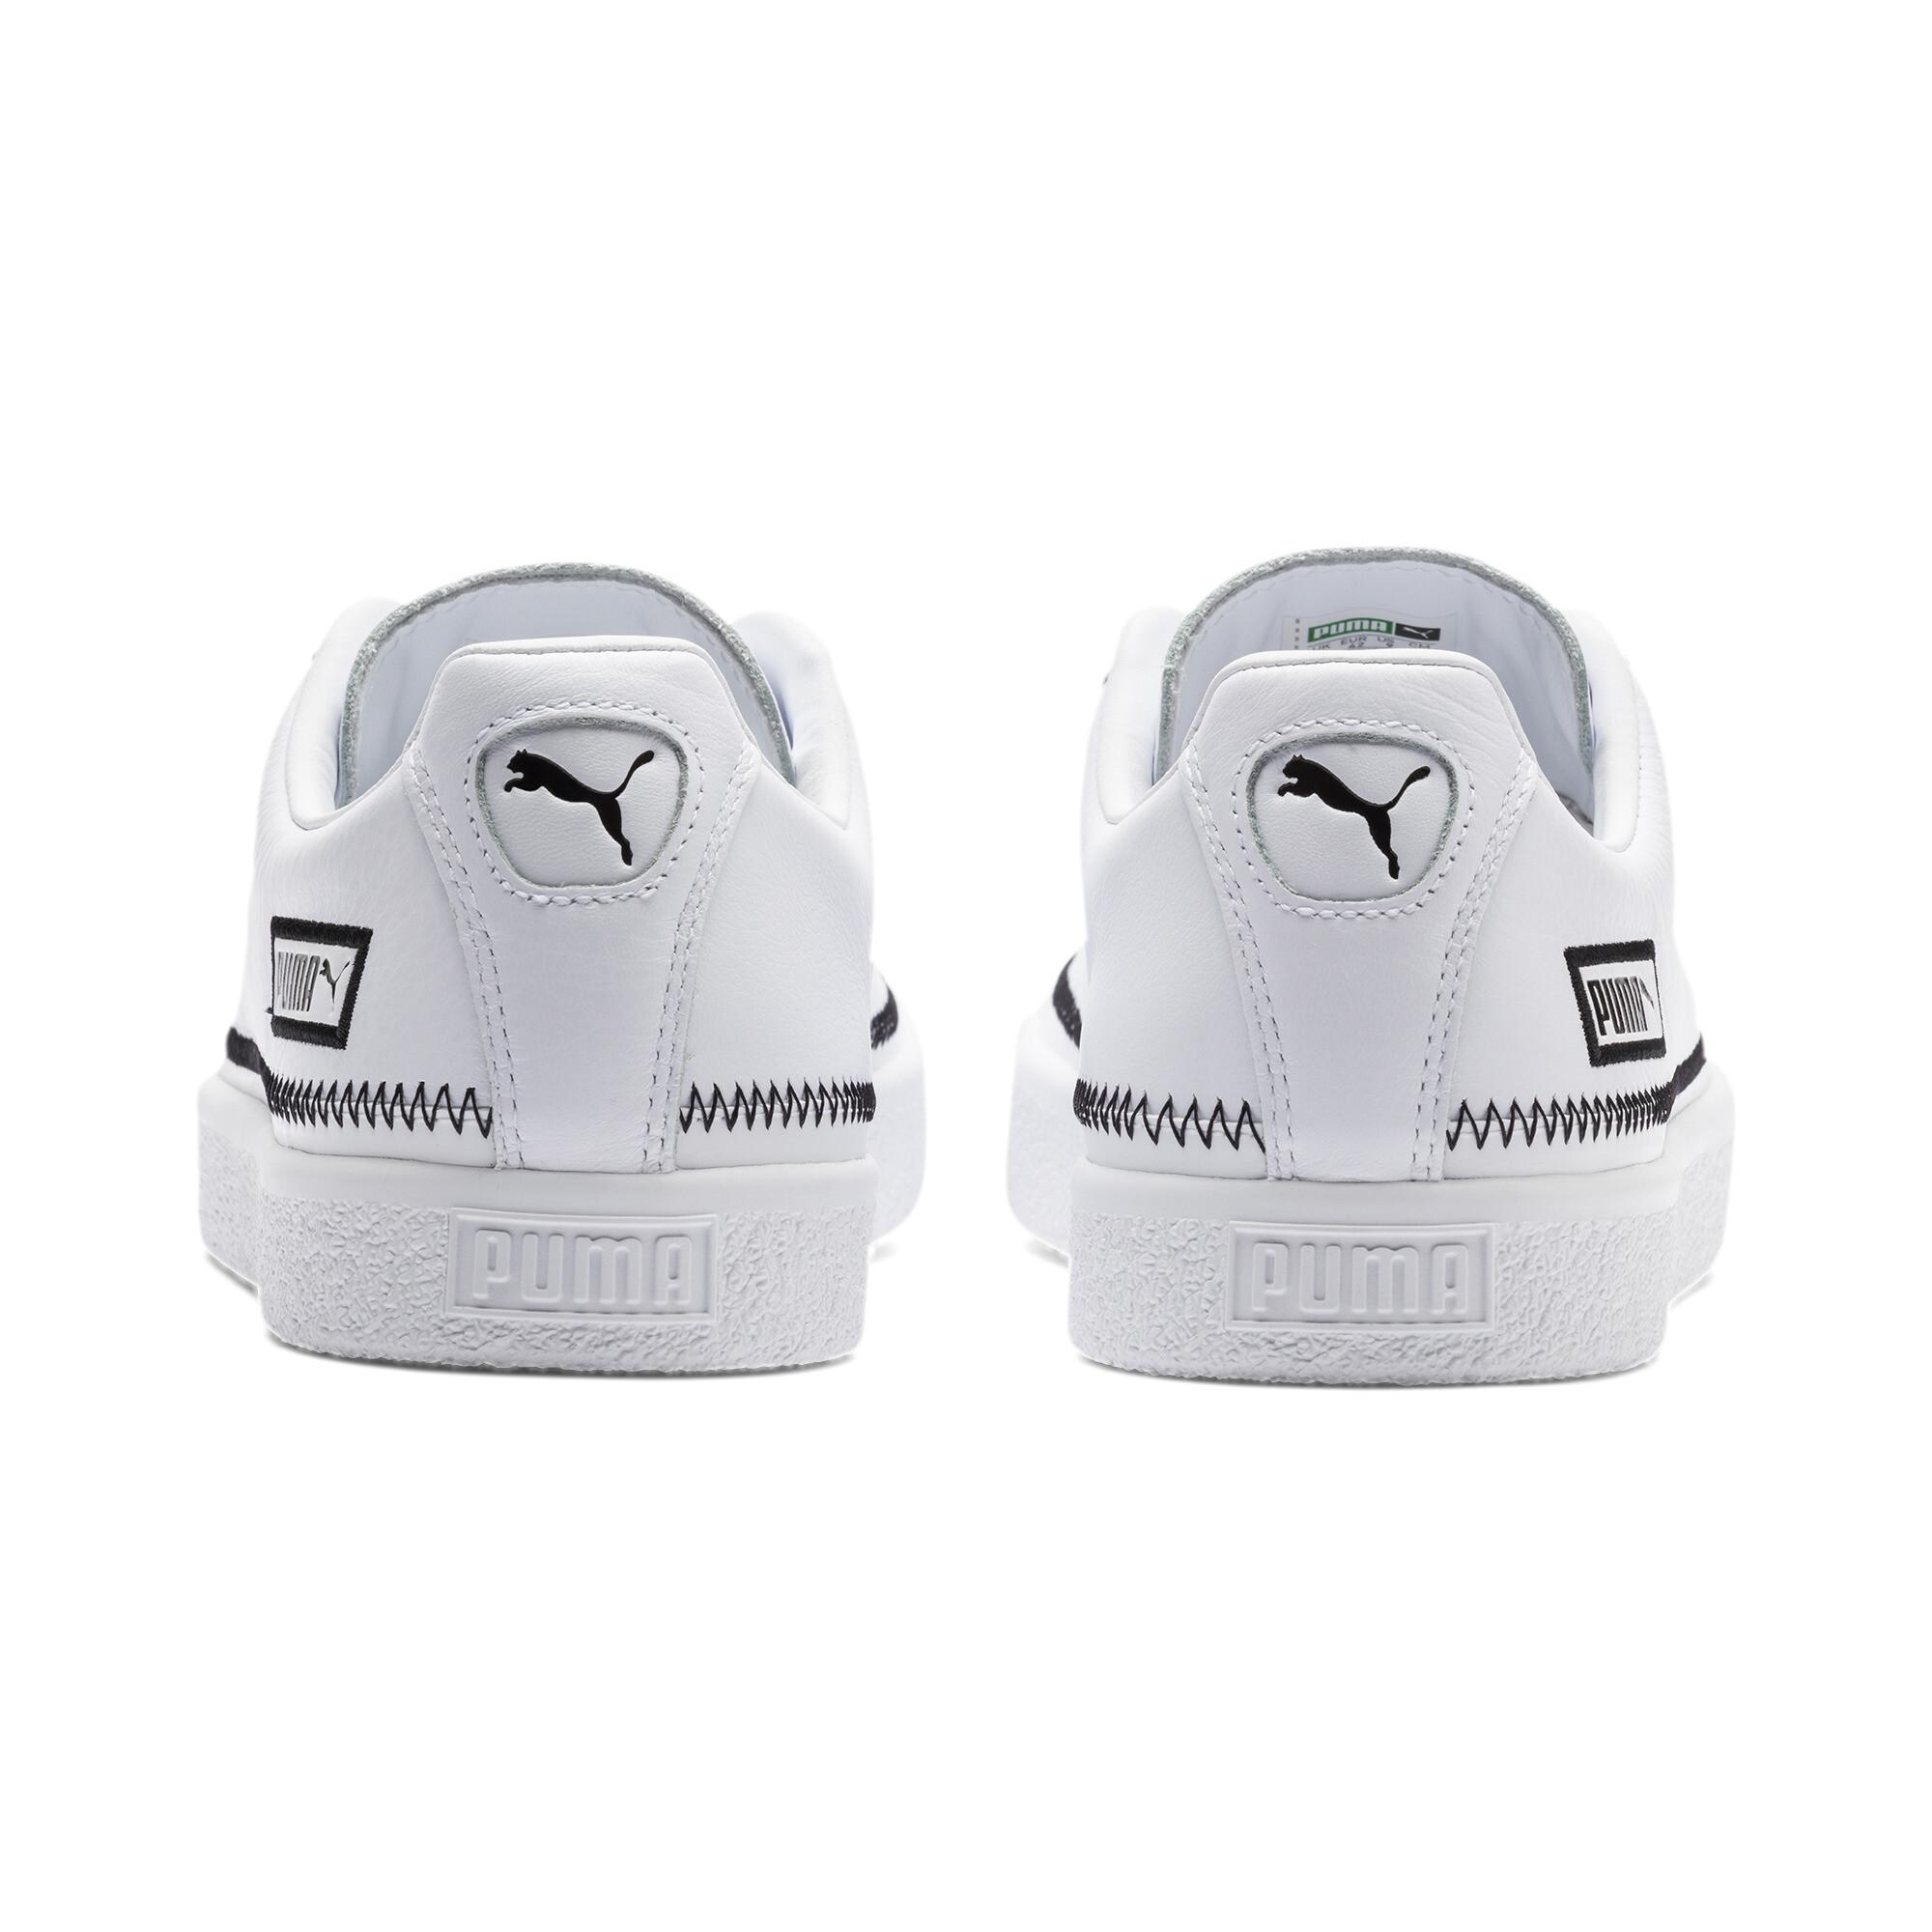 Indexbild 21 - PUMA Basket Stitch Sneaker Unisex Schuhe Neu